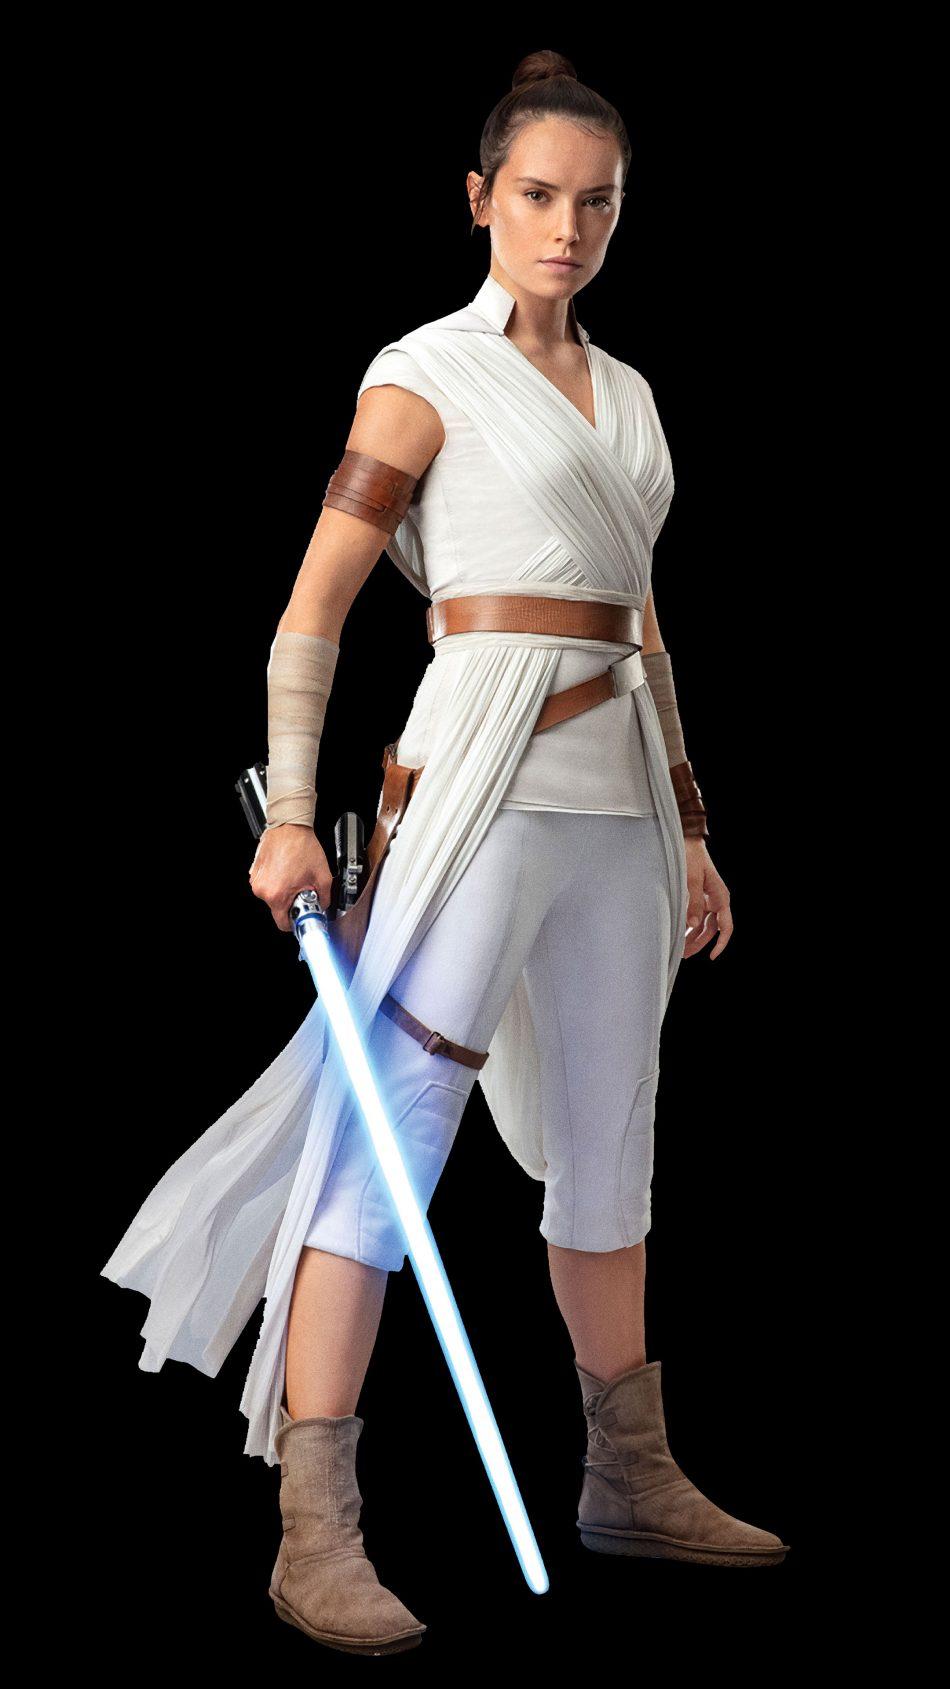 Star Wars The Rise Of Skywalker Phone Wallpaper 4k Singebloggg